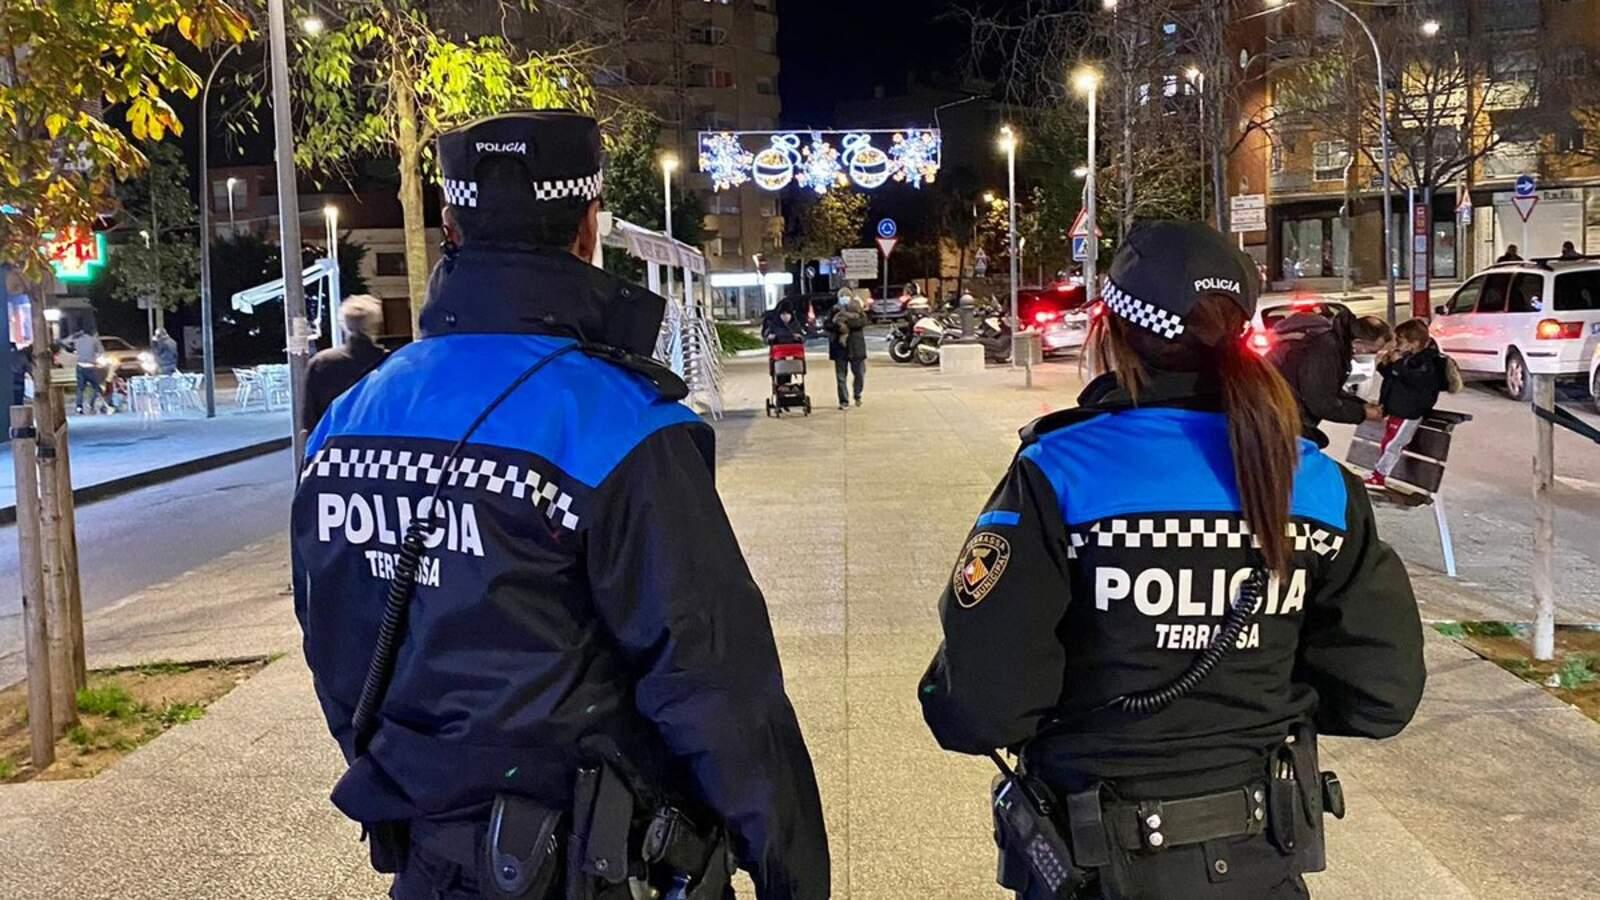 Una patrulla de la Policia Municipal de Terrassa